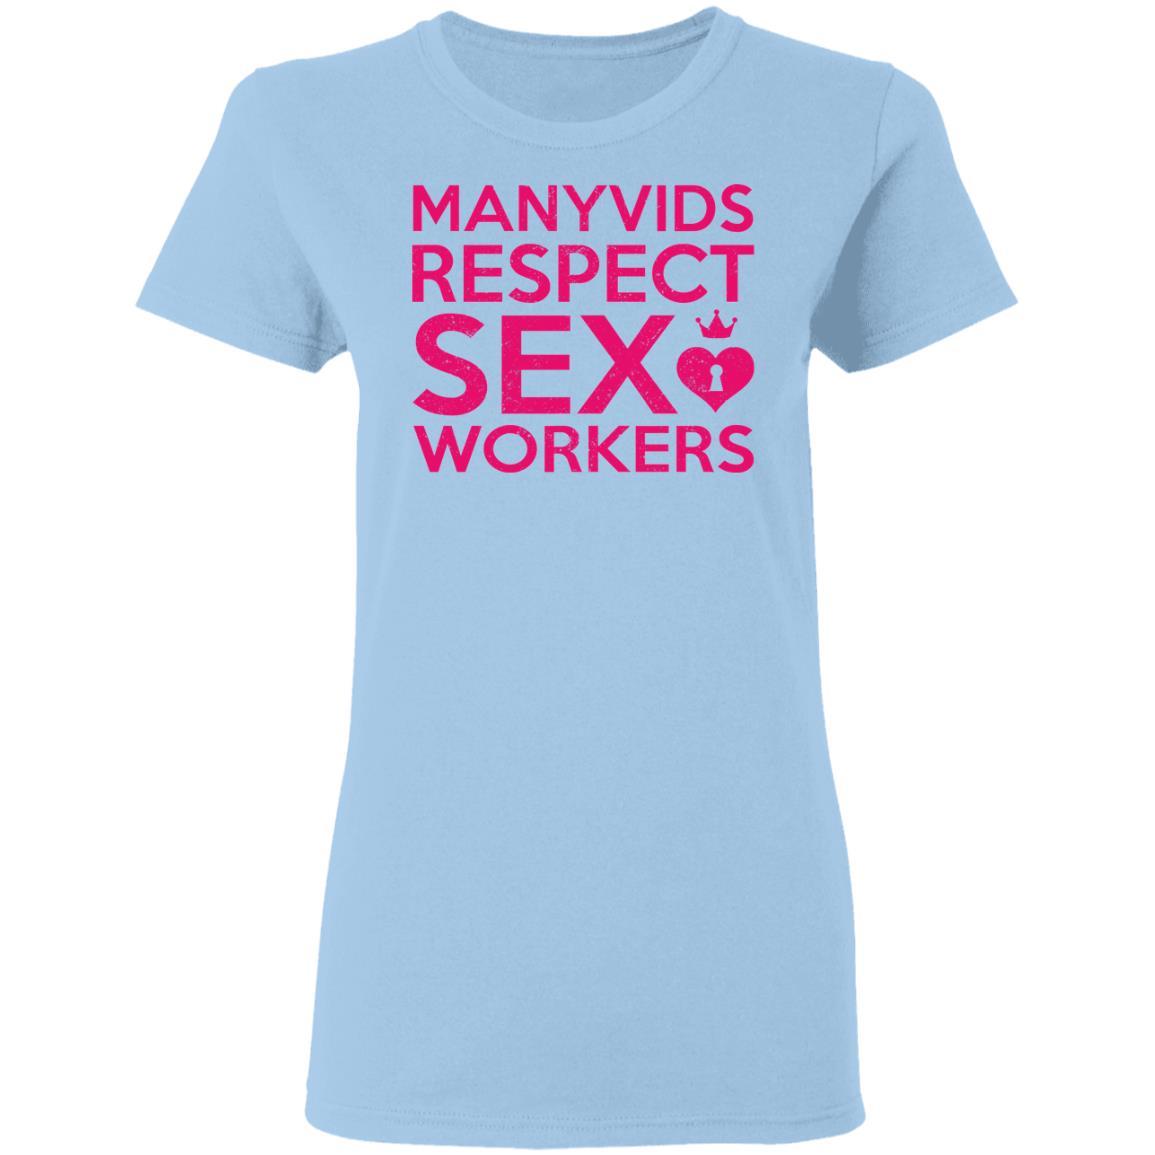 Manyvids Respect Sex Workers T-Shirts | El Real Tex-Mex